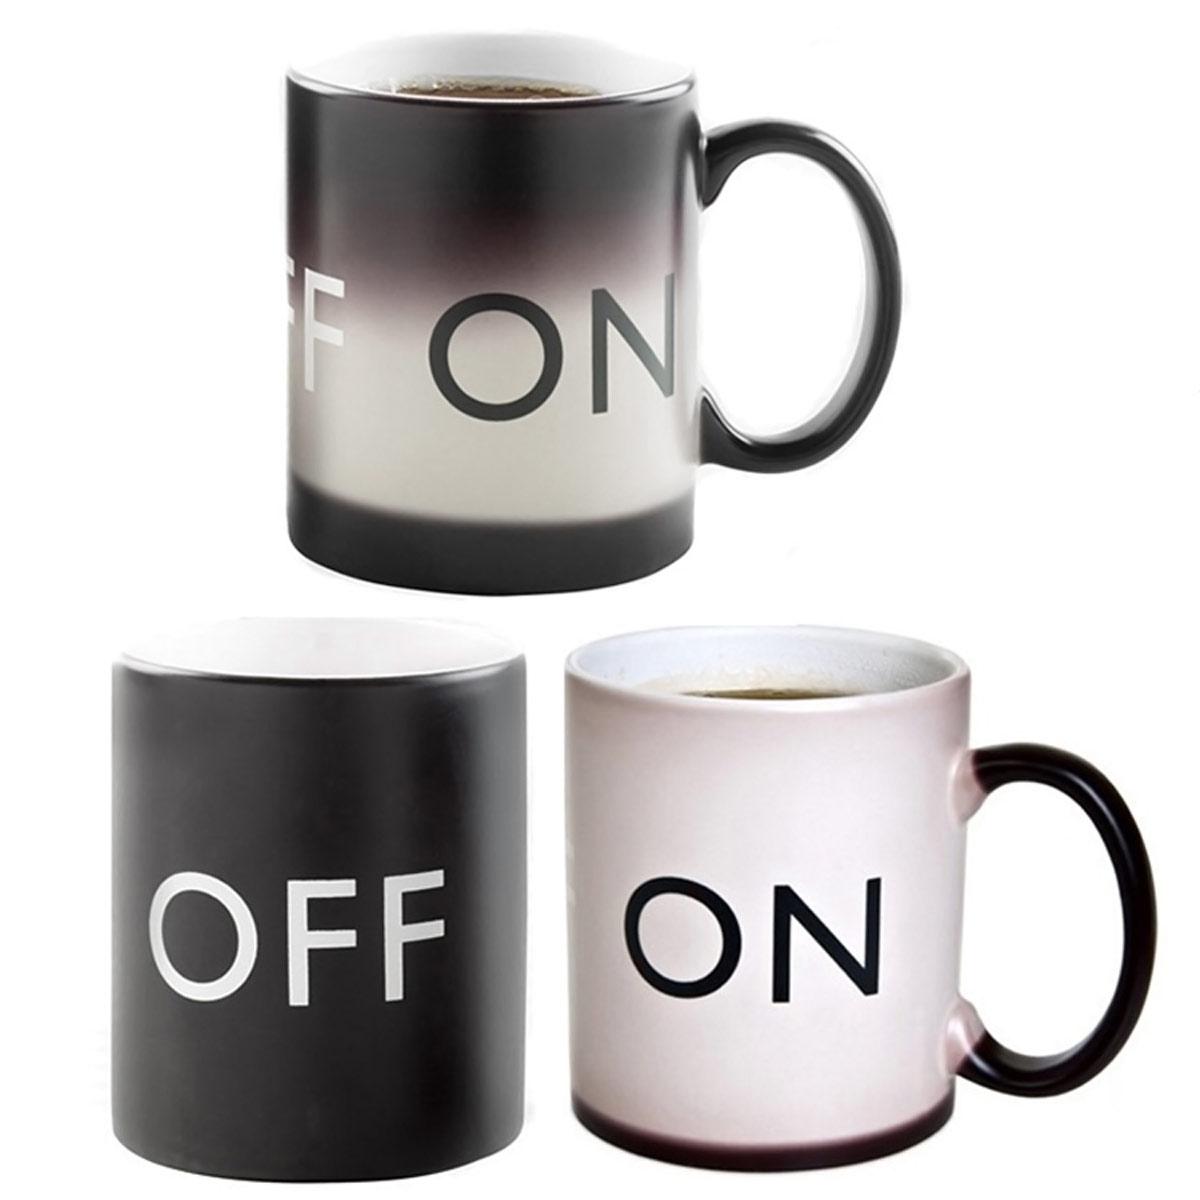 on off tasse thermo kaffeetasse kaffeebecher coffee mug